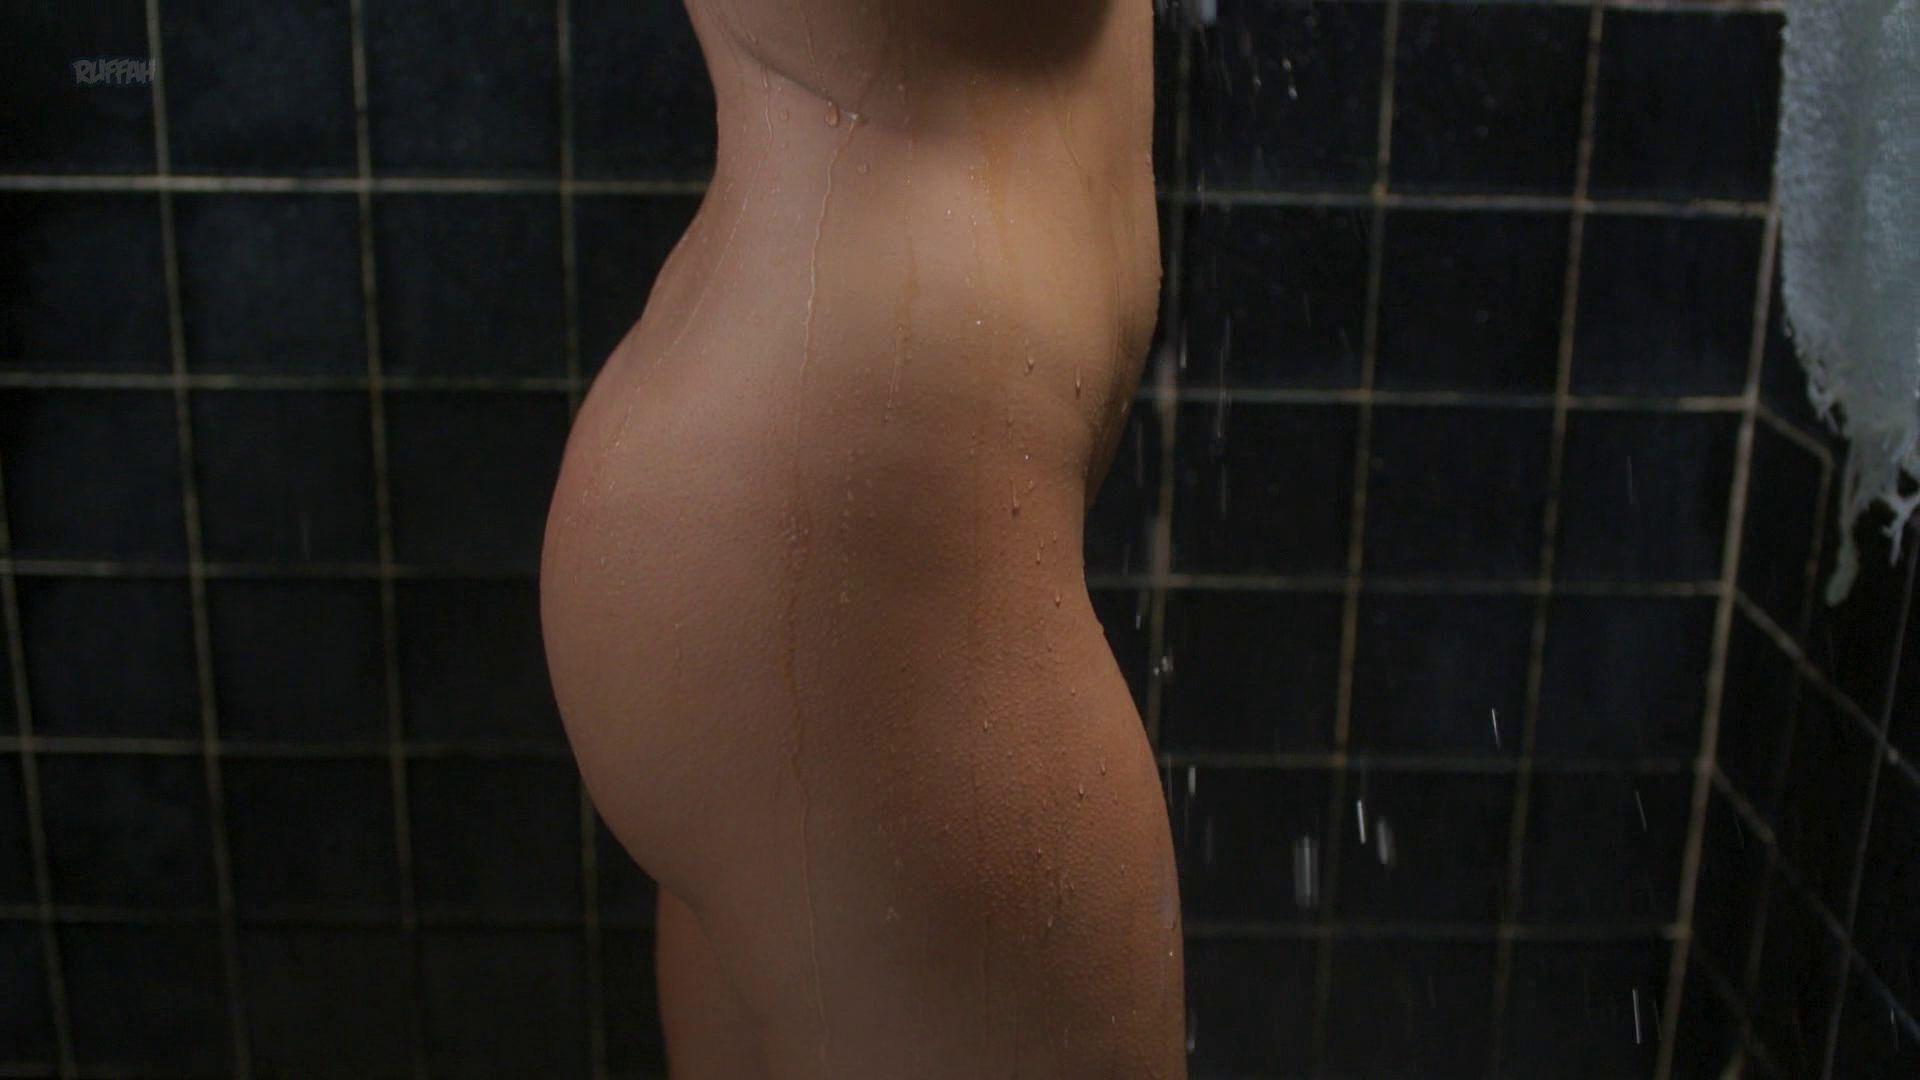 Paulina gaitan diablo guardian s01e08 sex scenes - 1 part 5